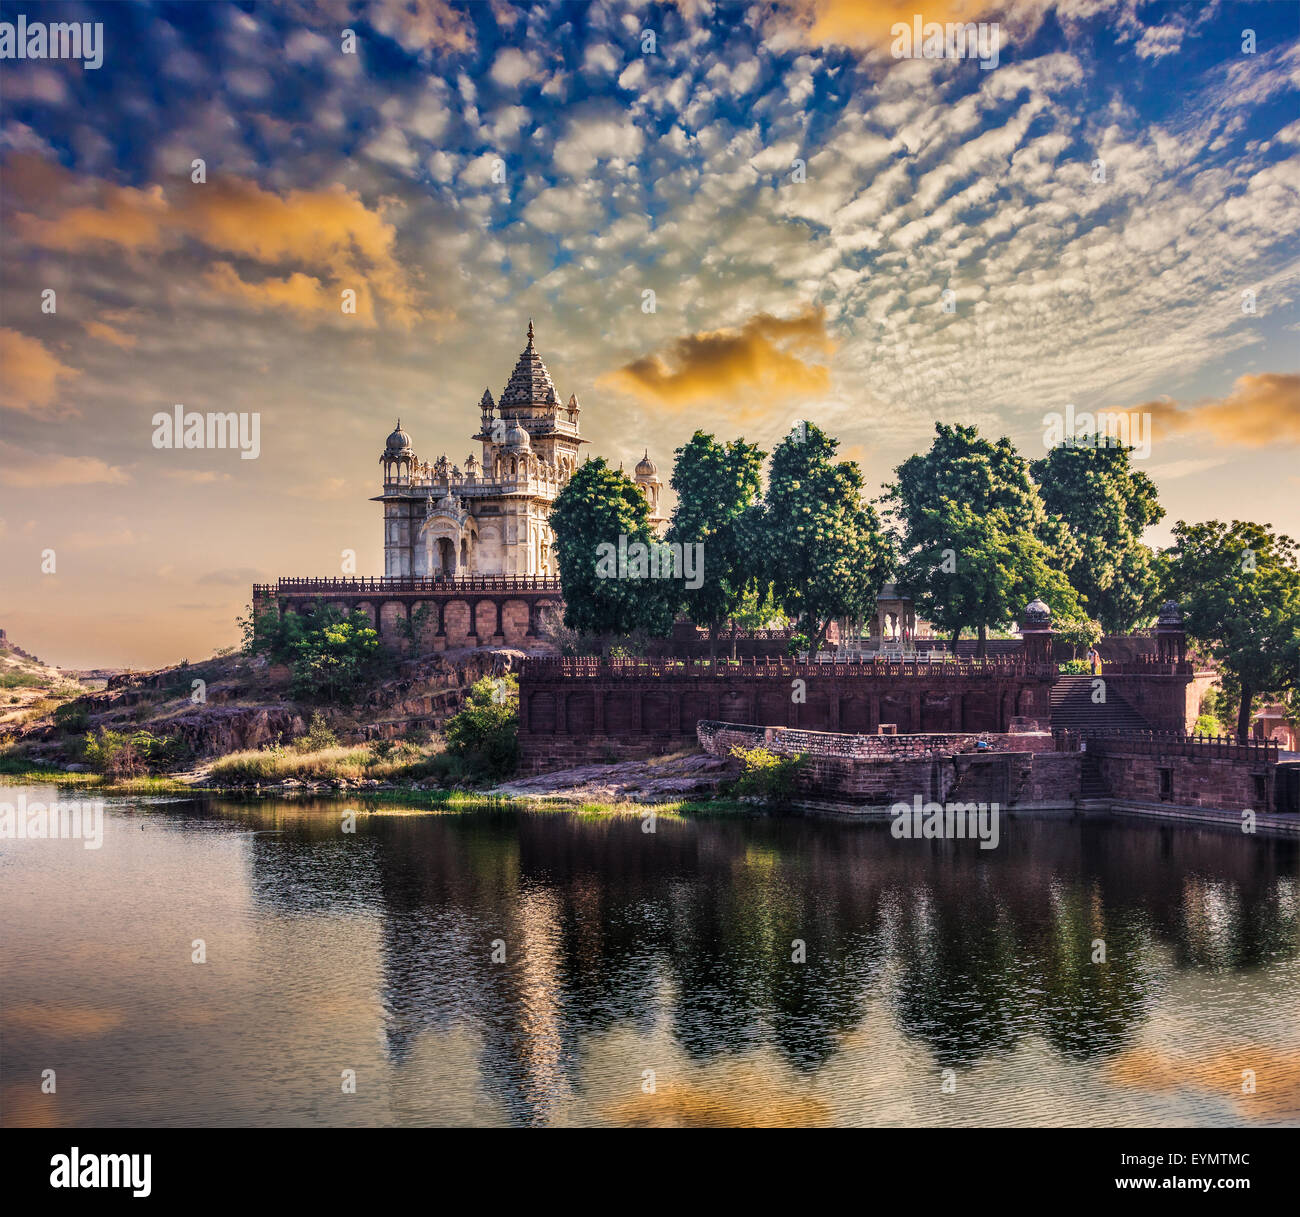 Jaswanth Thada mausoleum on sunset, Jodhpur, Rajasthan, India - Stock Image